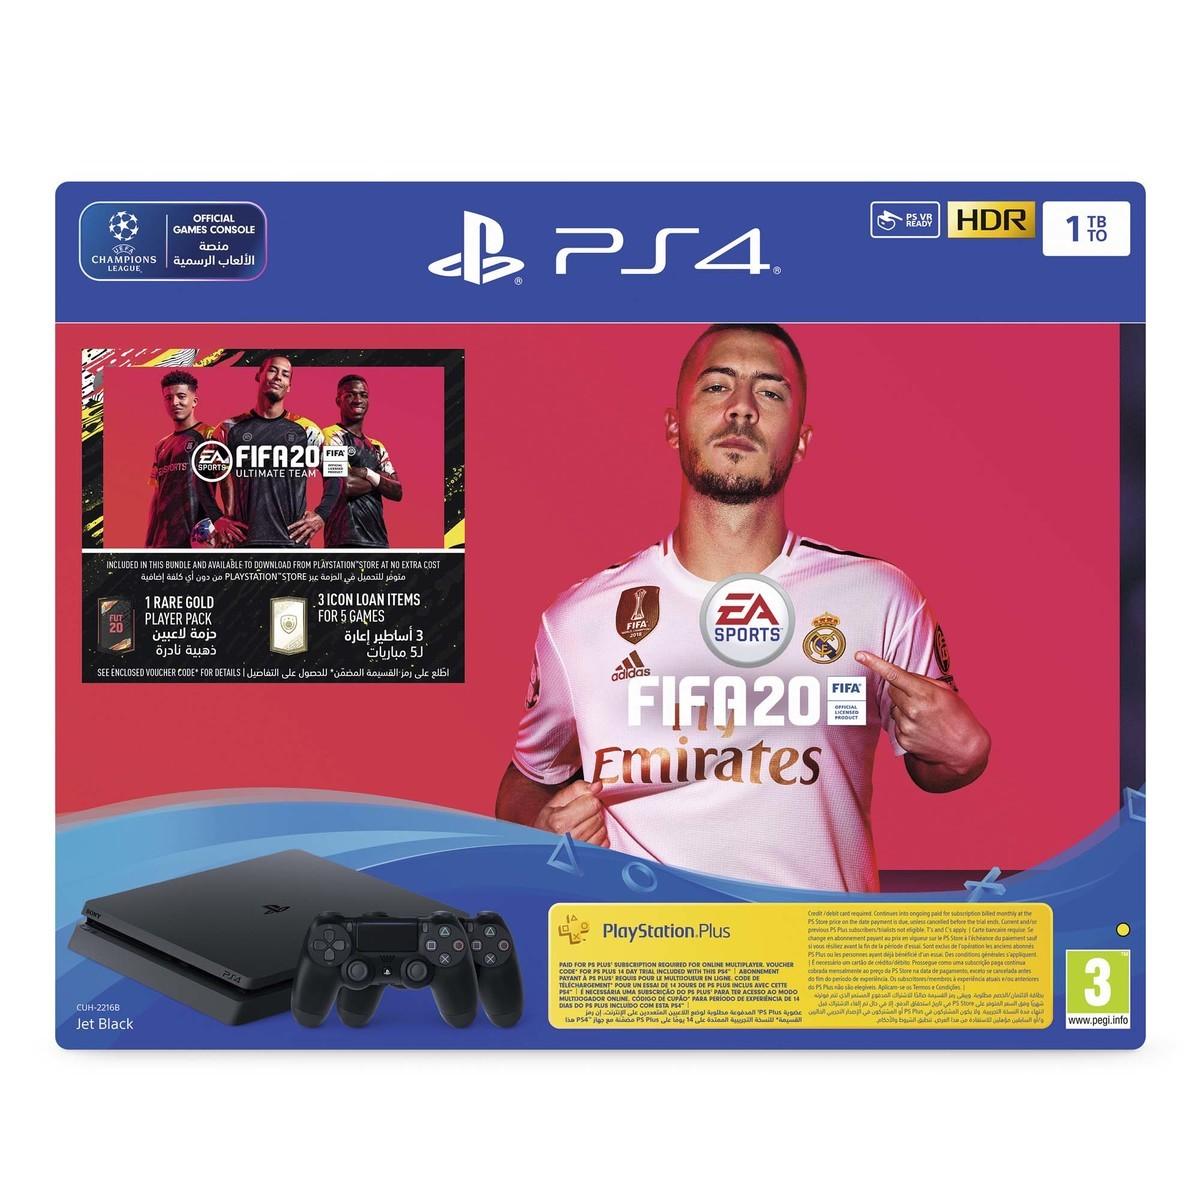 Sony PlayStation 4 Slim 1TB FIFA20 + DS4 Controller Bundle